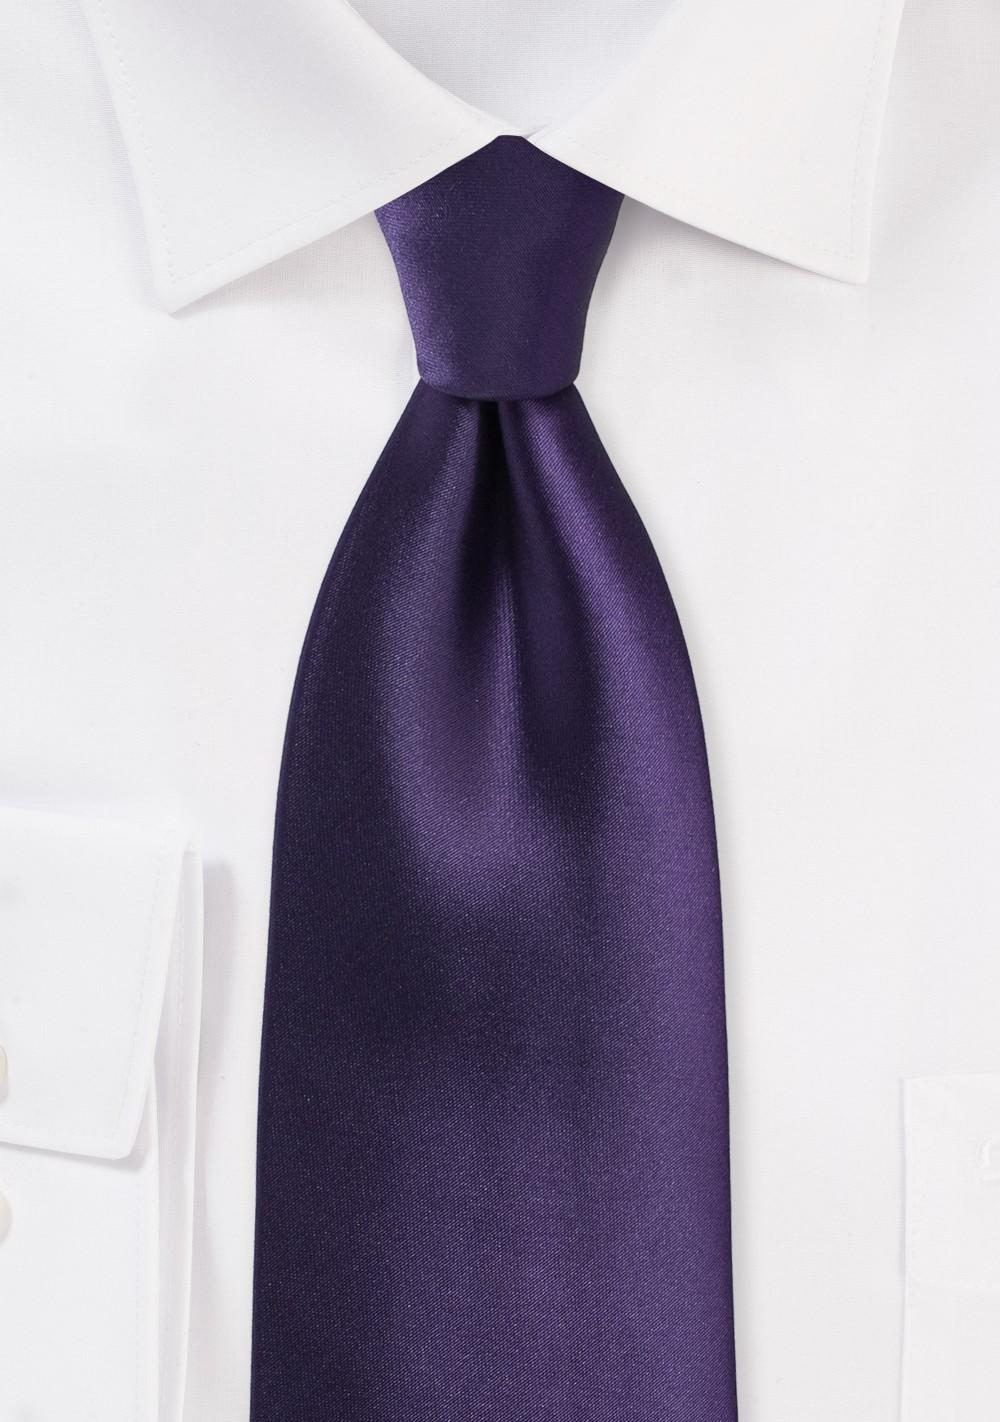 Majesty Purple Necktie